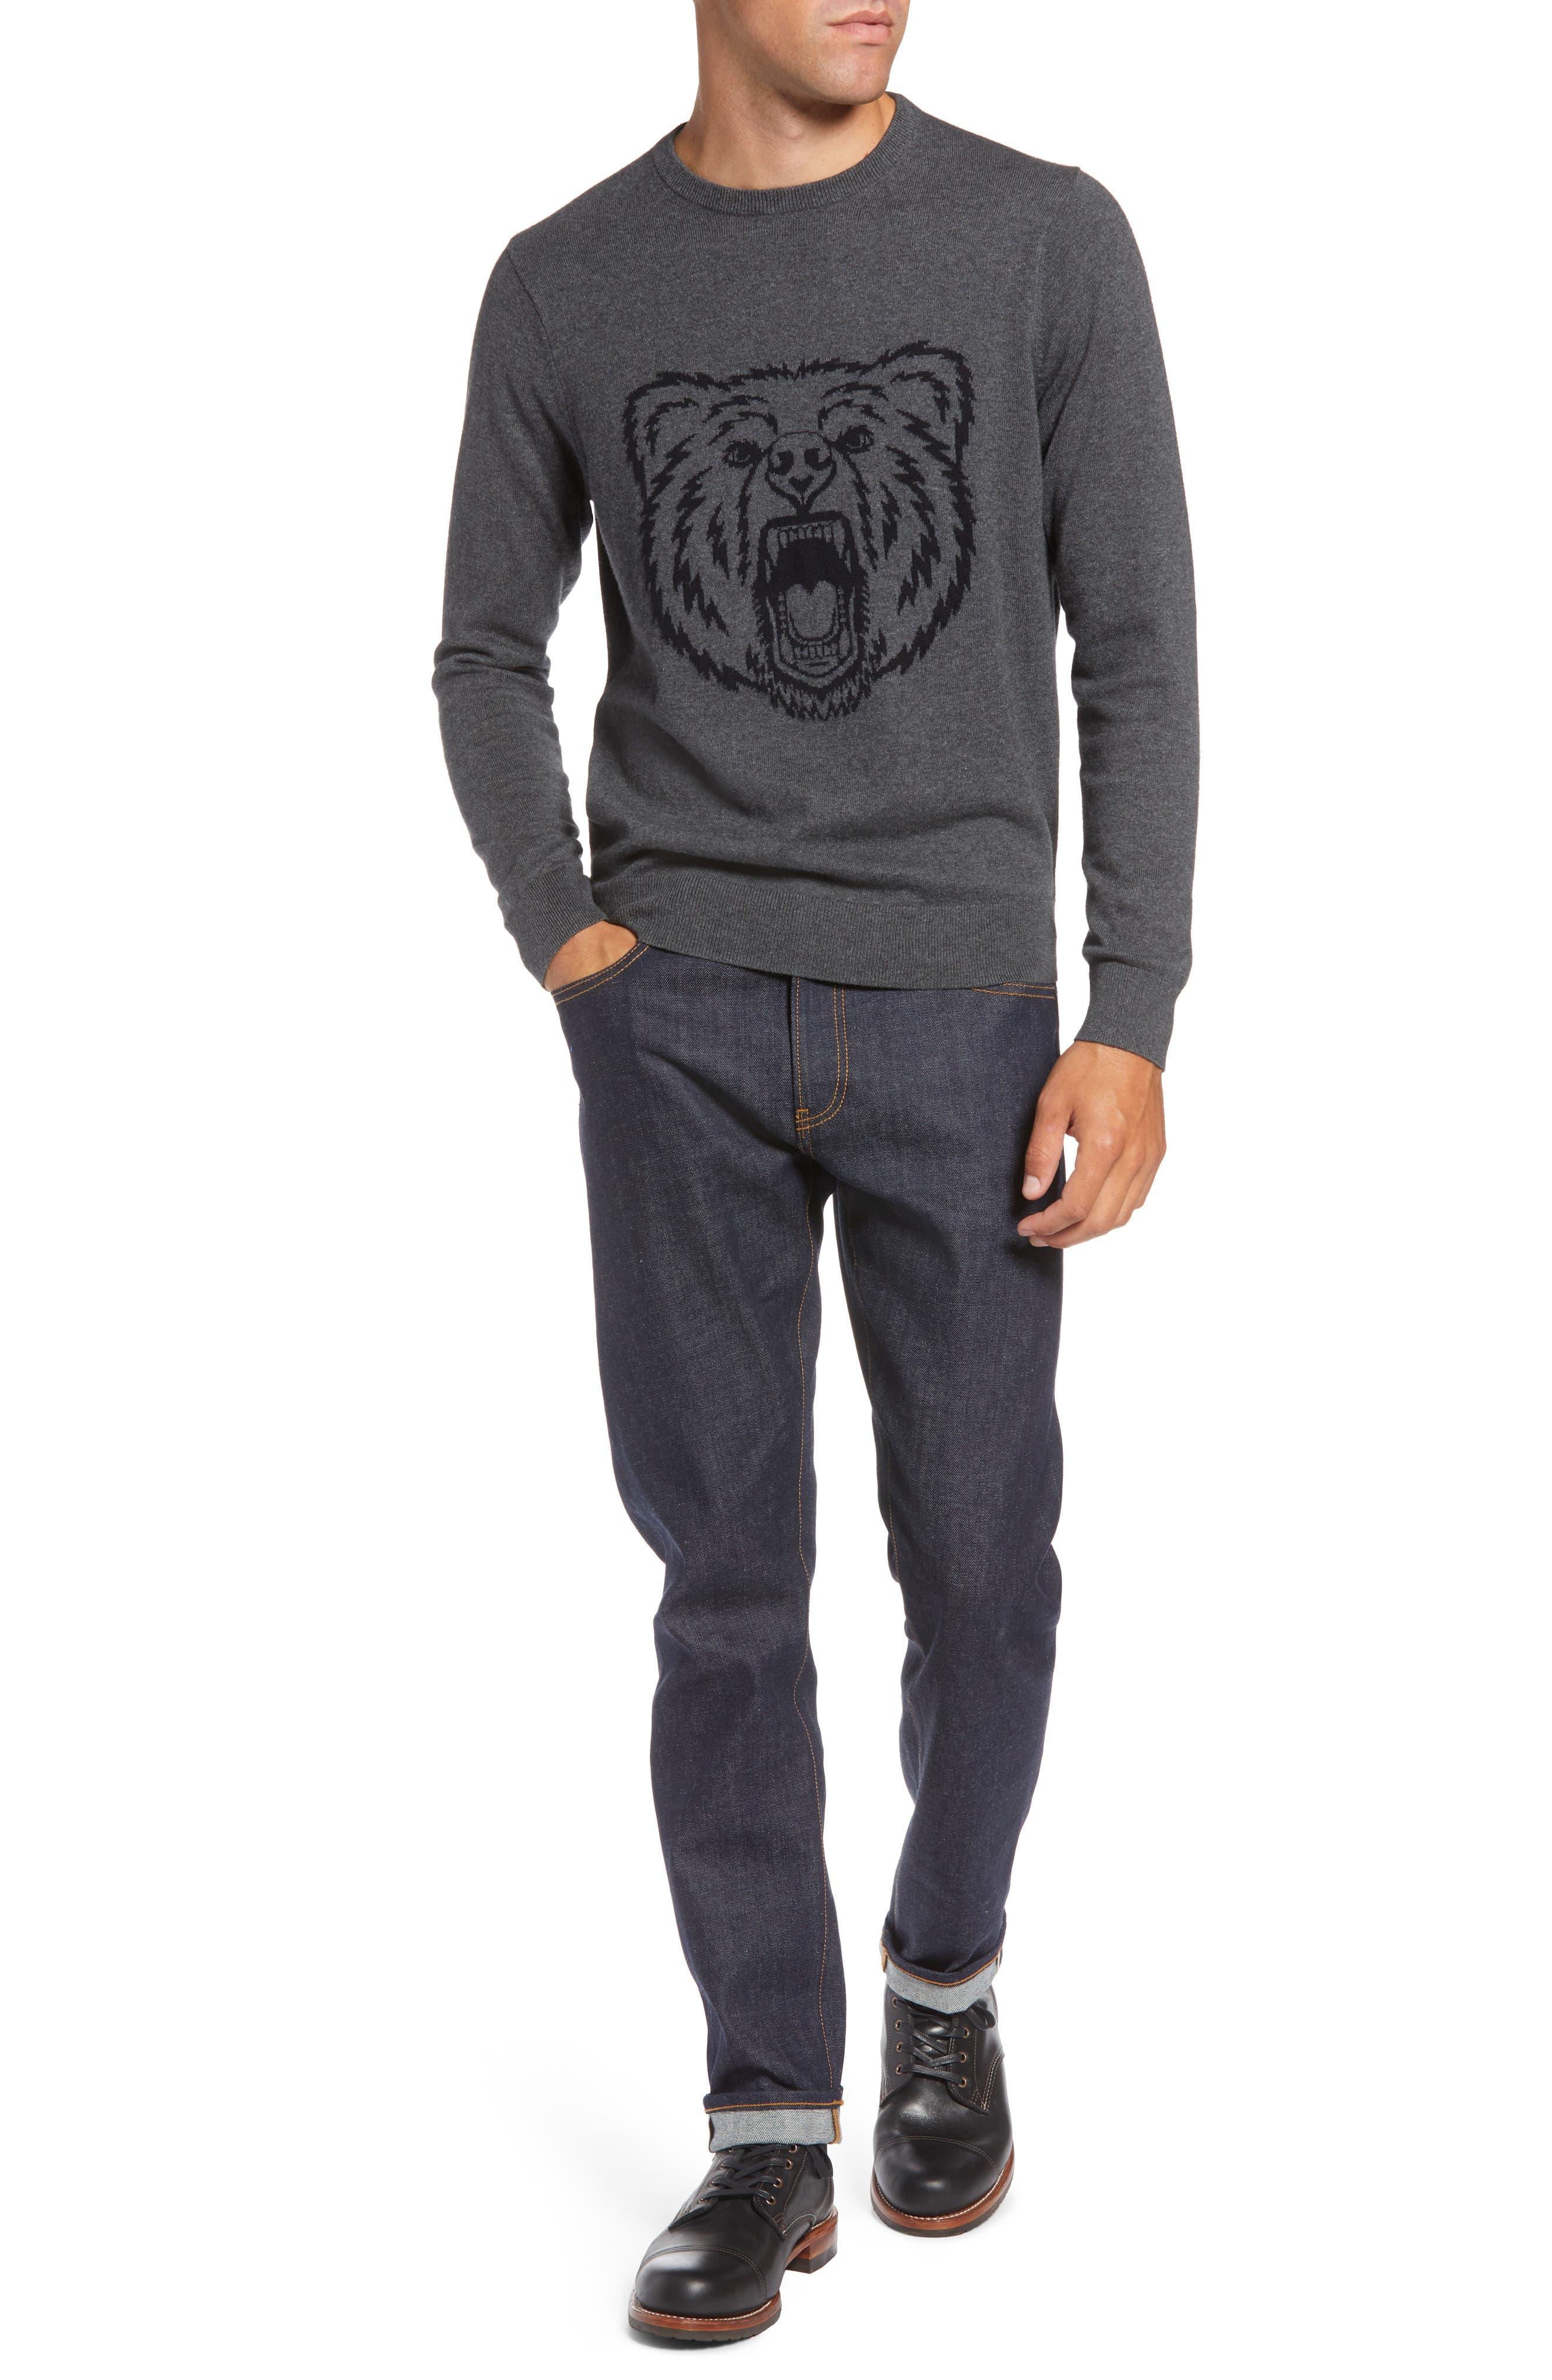 Bear Crewneck Sweater,                             Alternate thumbnail 4, color,                             GREY CASTLEROCK MARL BEAR